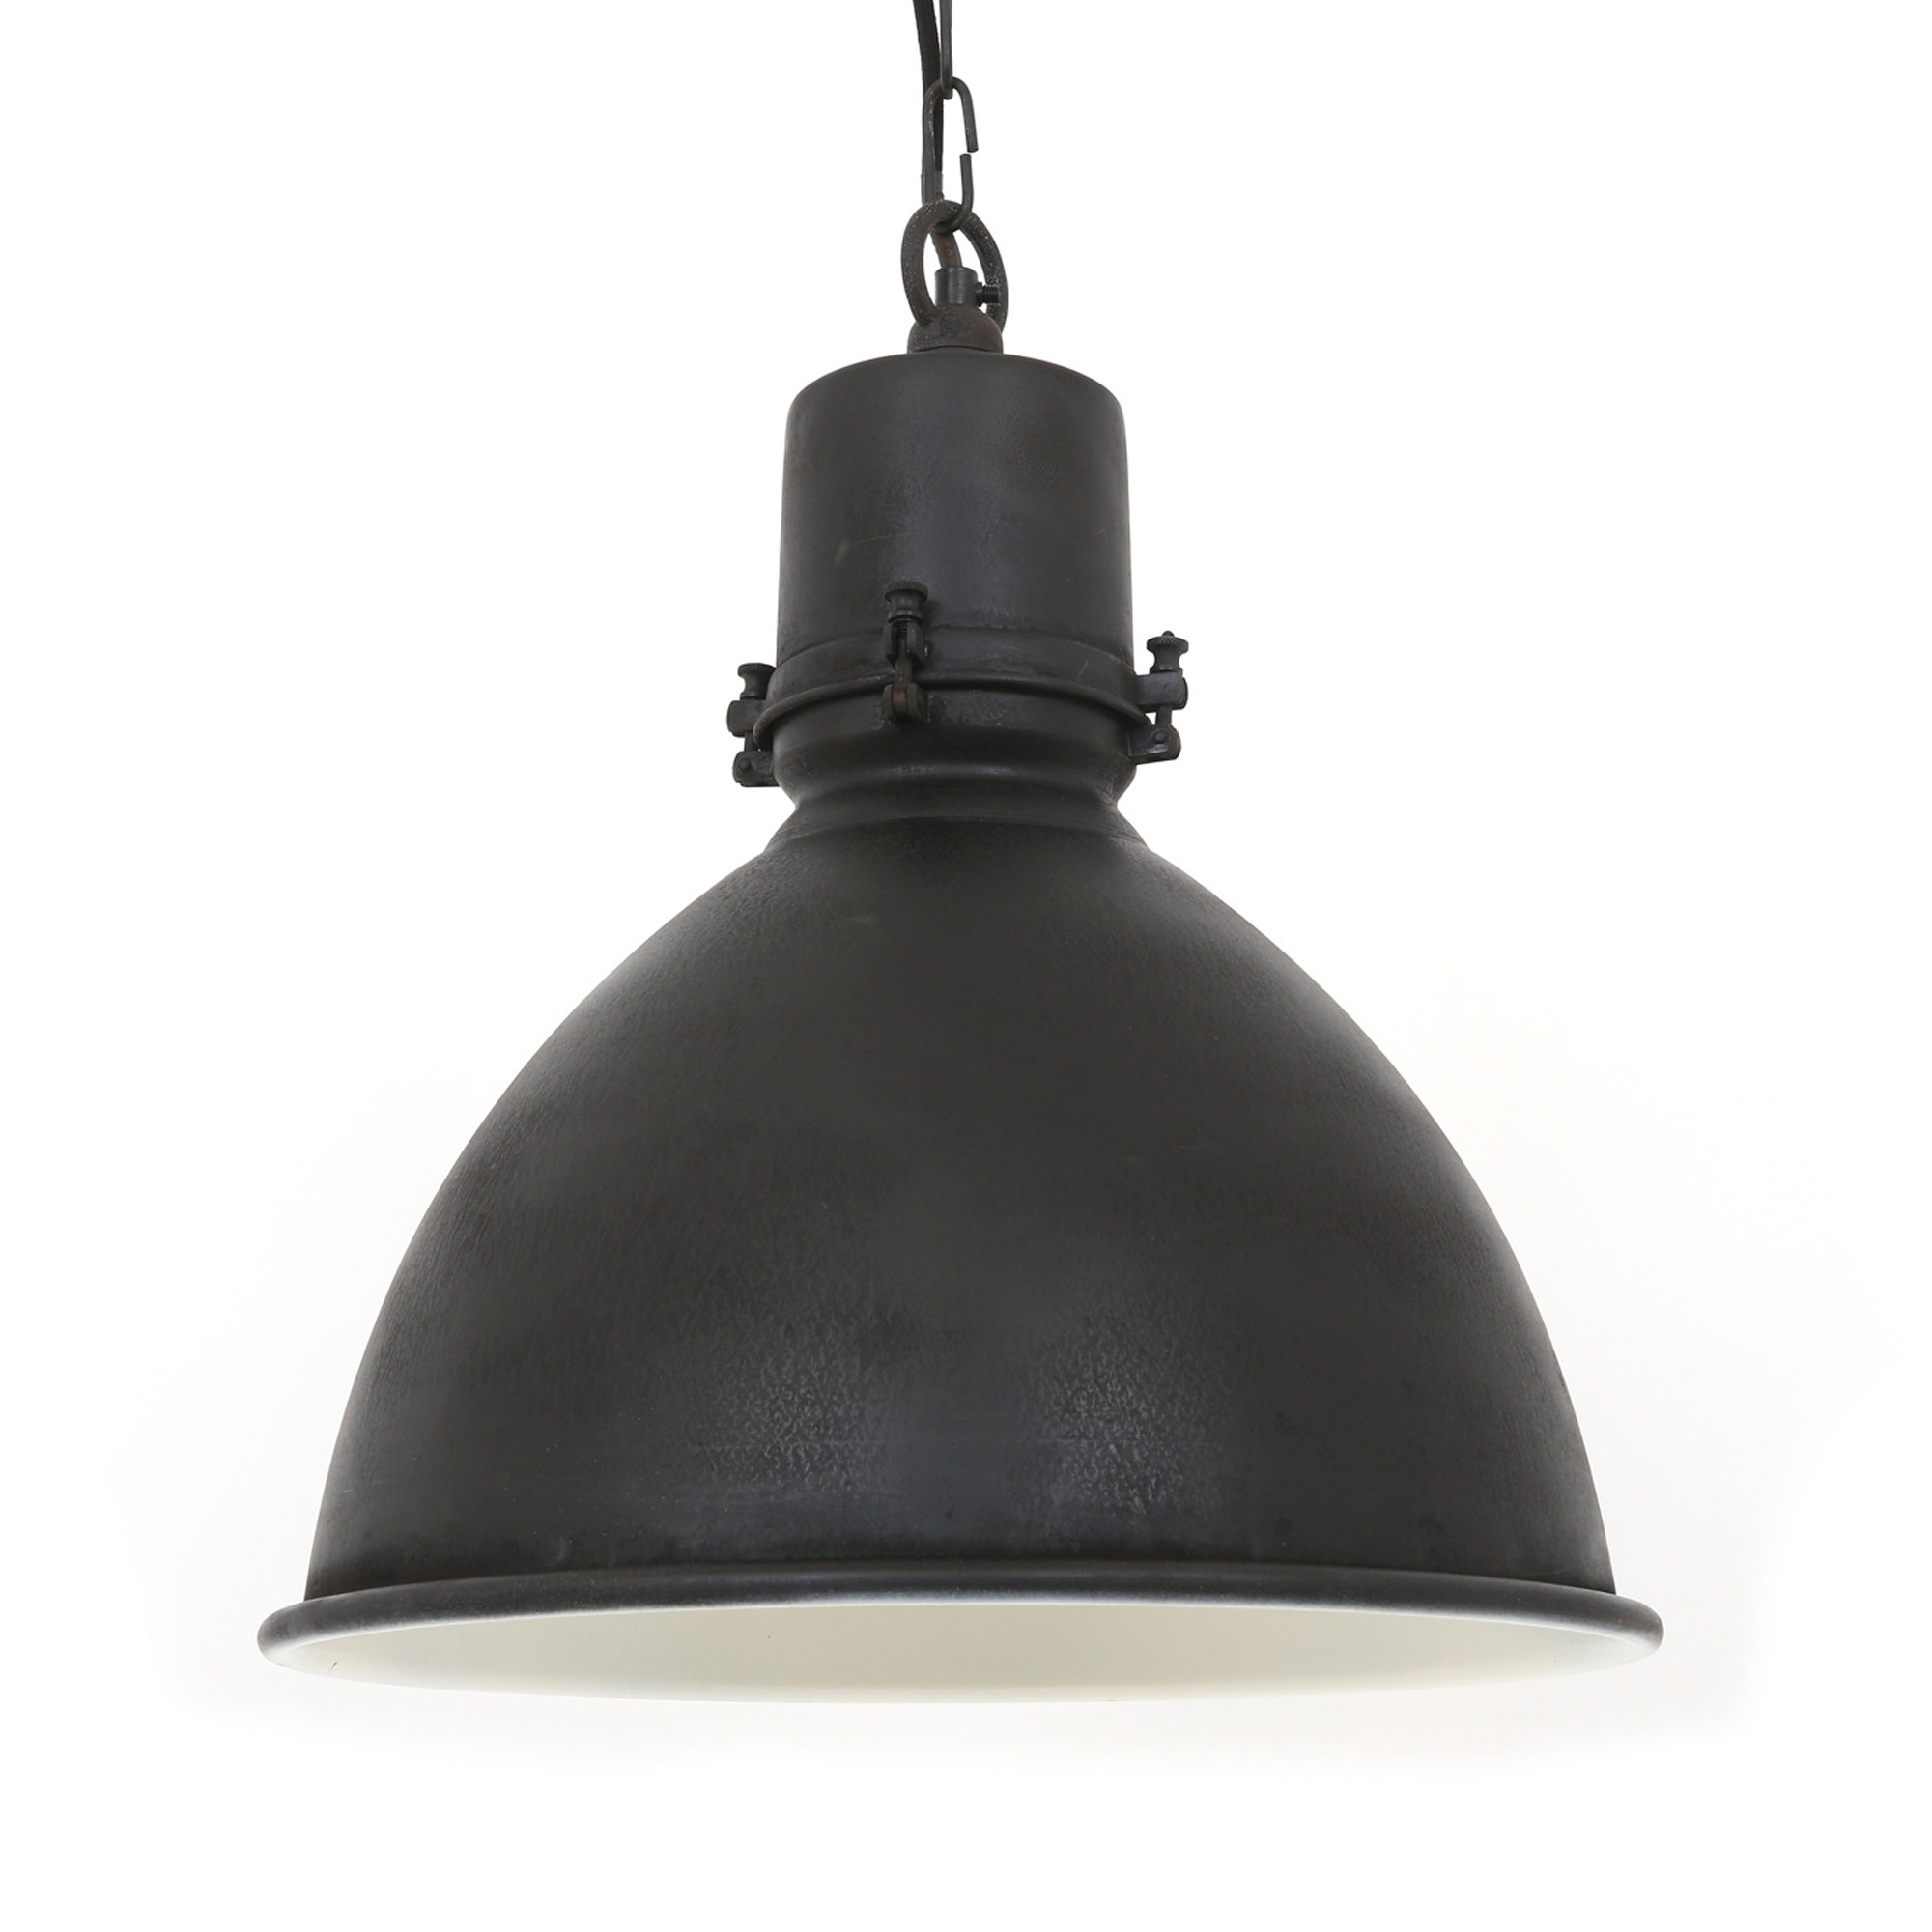 Nostaluce Falcon Hanglamp Antiek Zwart